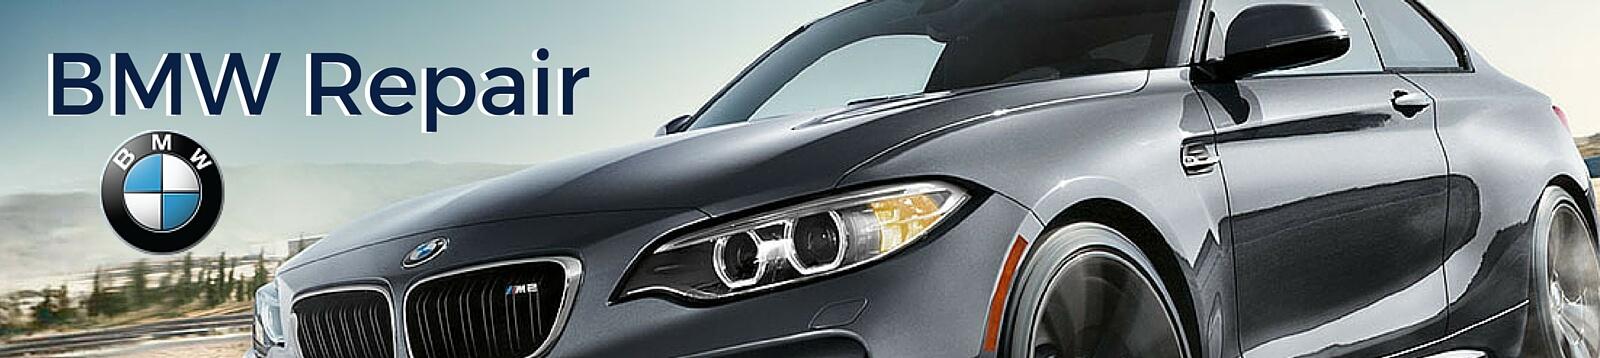 BMW-Repair-Header-Image.jpg